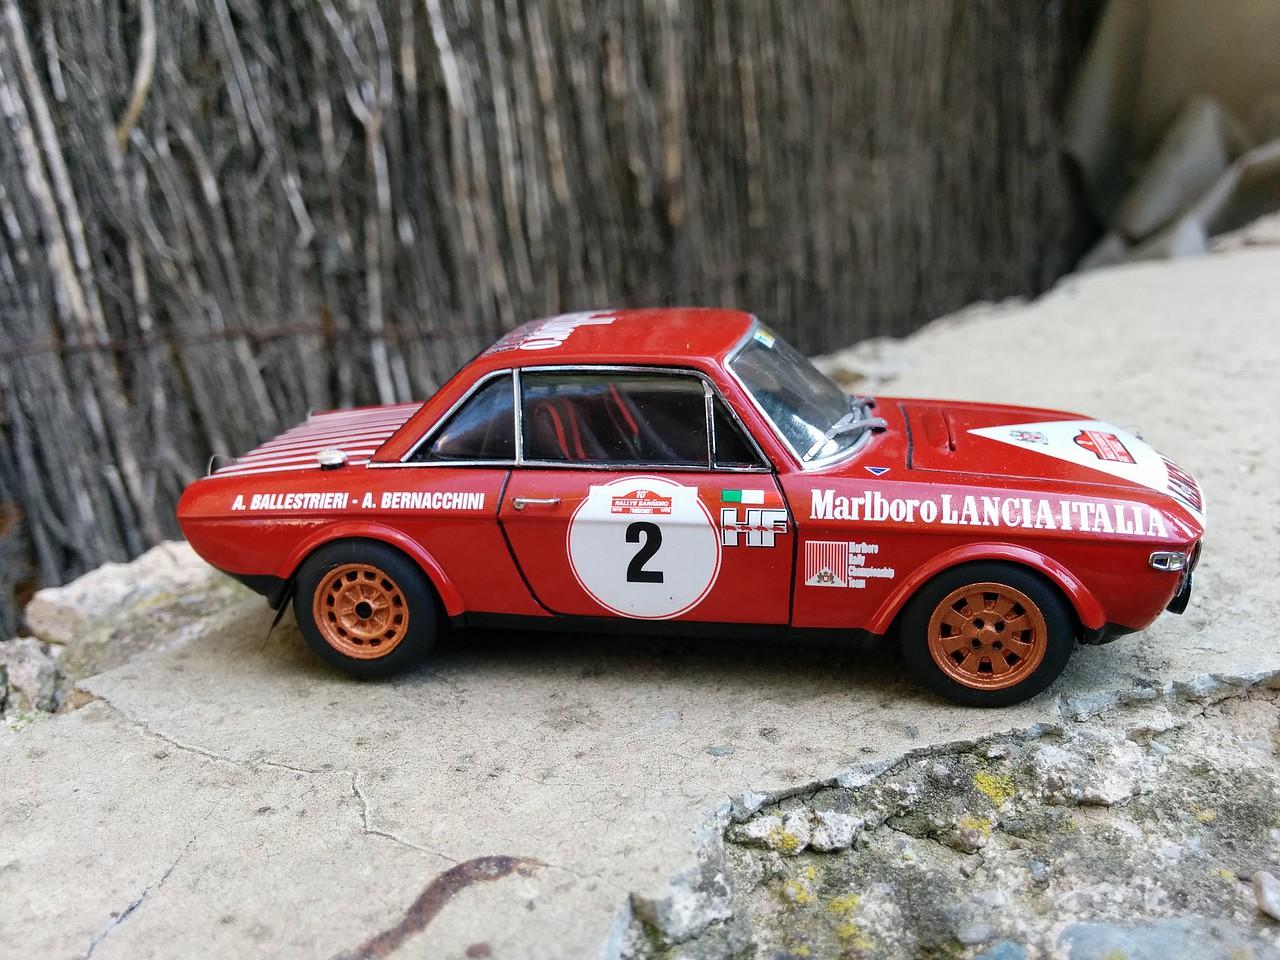 Lancia Fulvia San Remo 72. Racing 43 a escala 1/43 38540003563B53720234365372021D